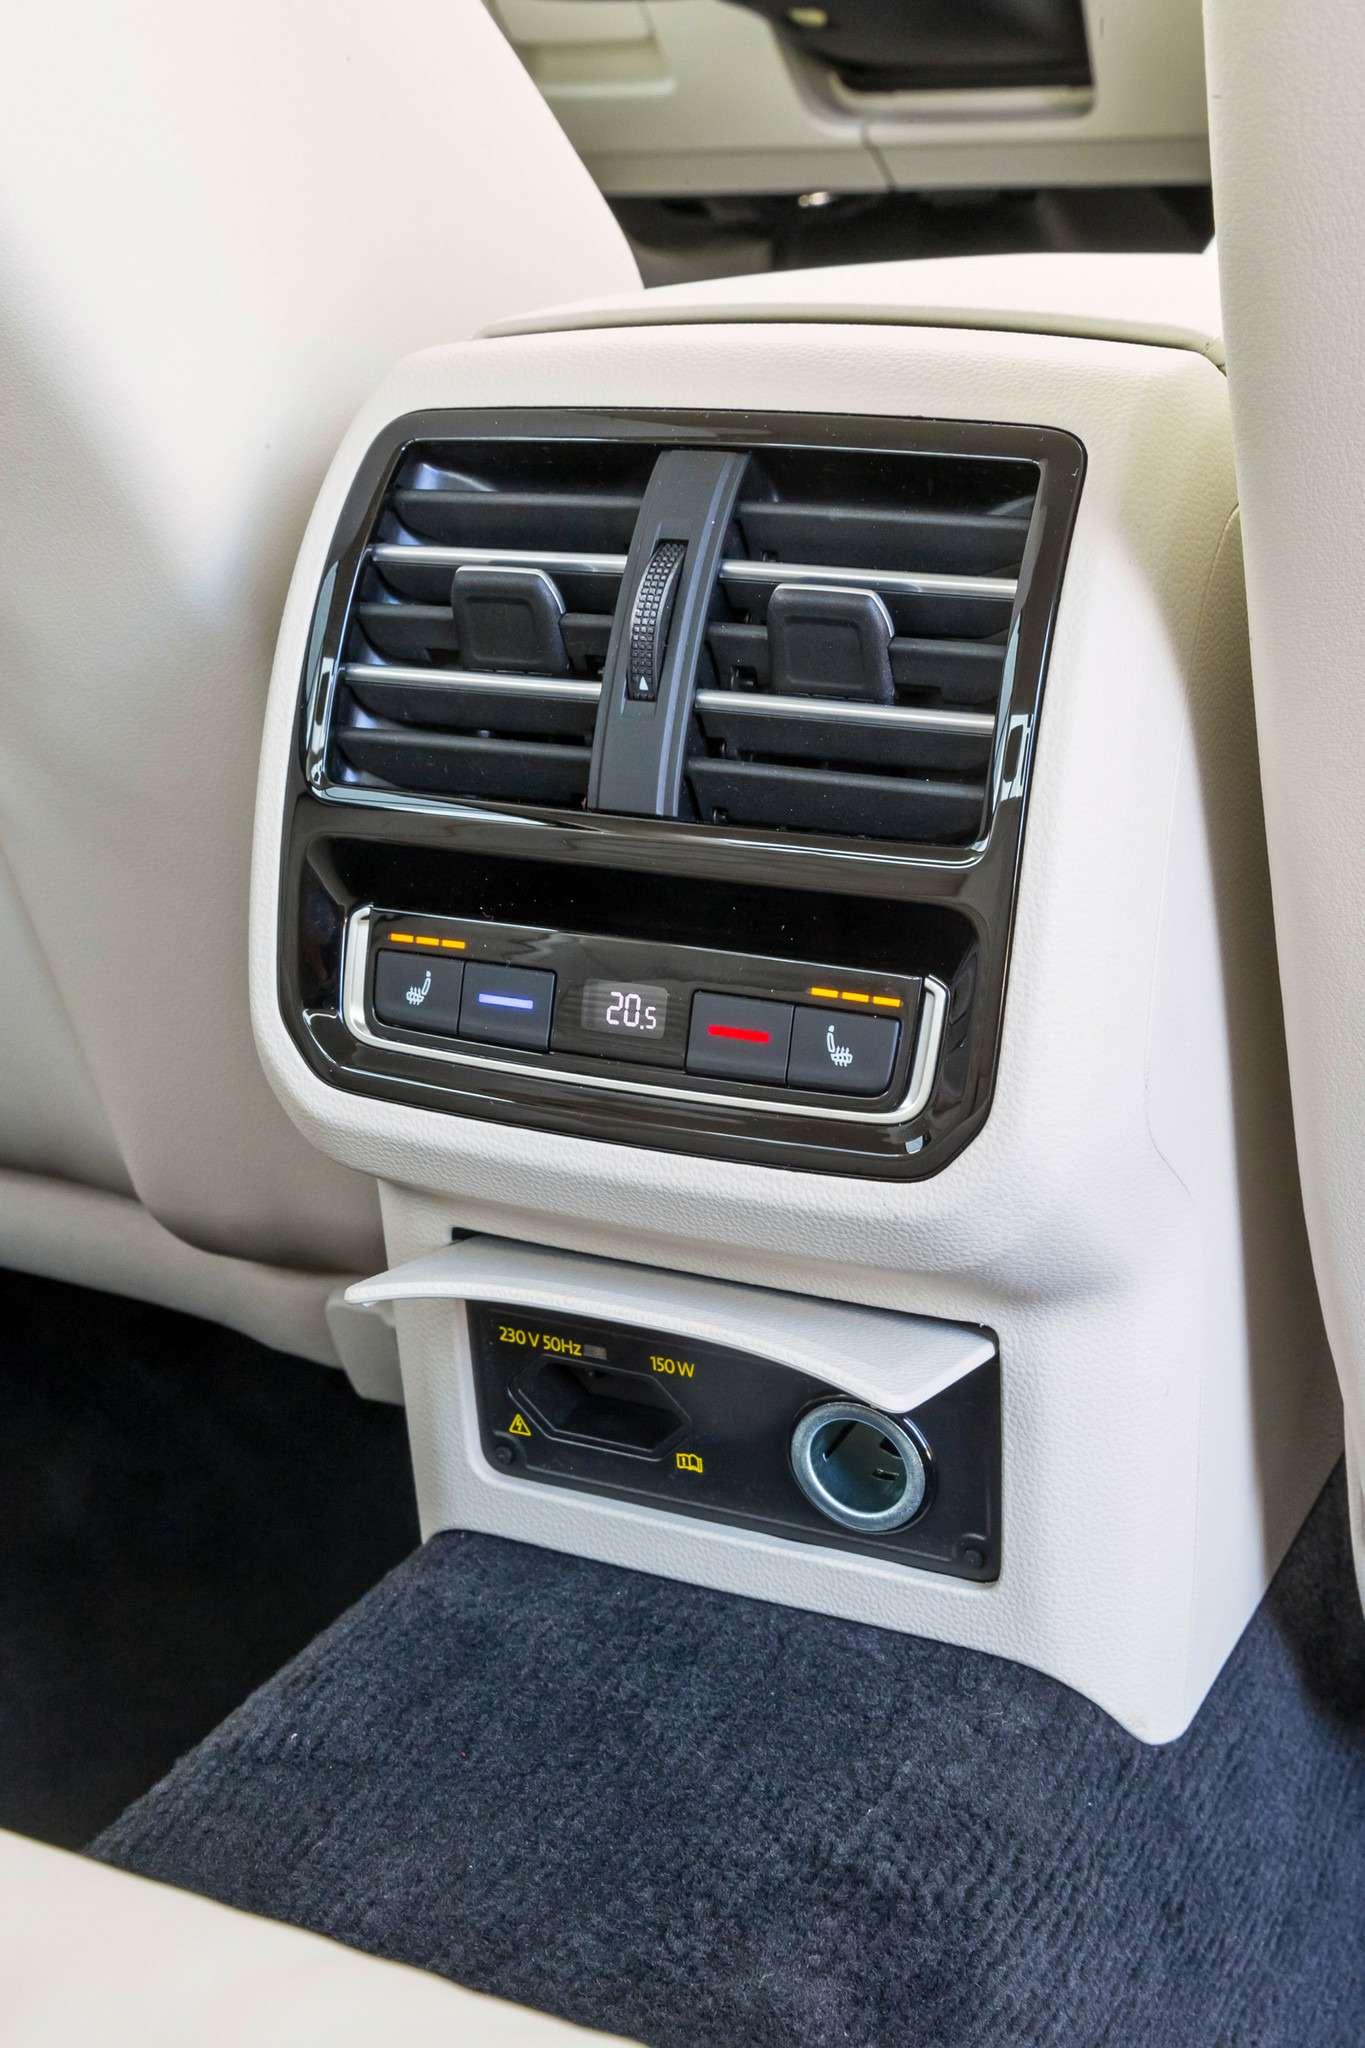 308-Passat_Mondeo_Mazda-6-zr09-15